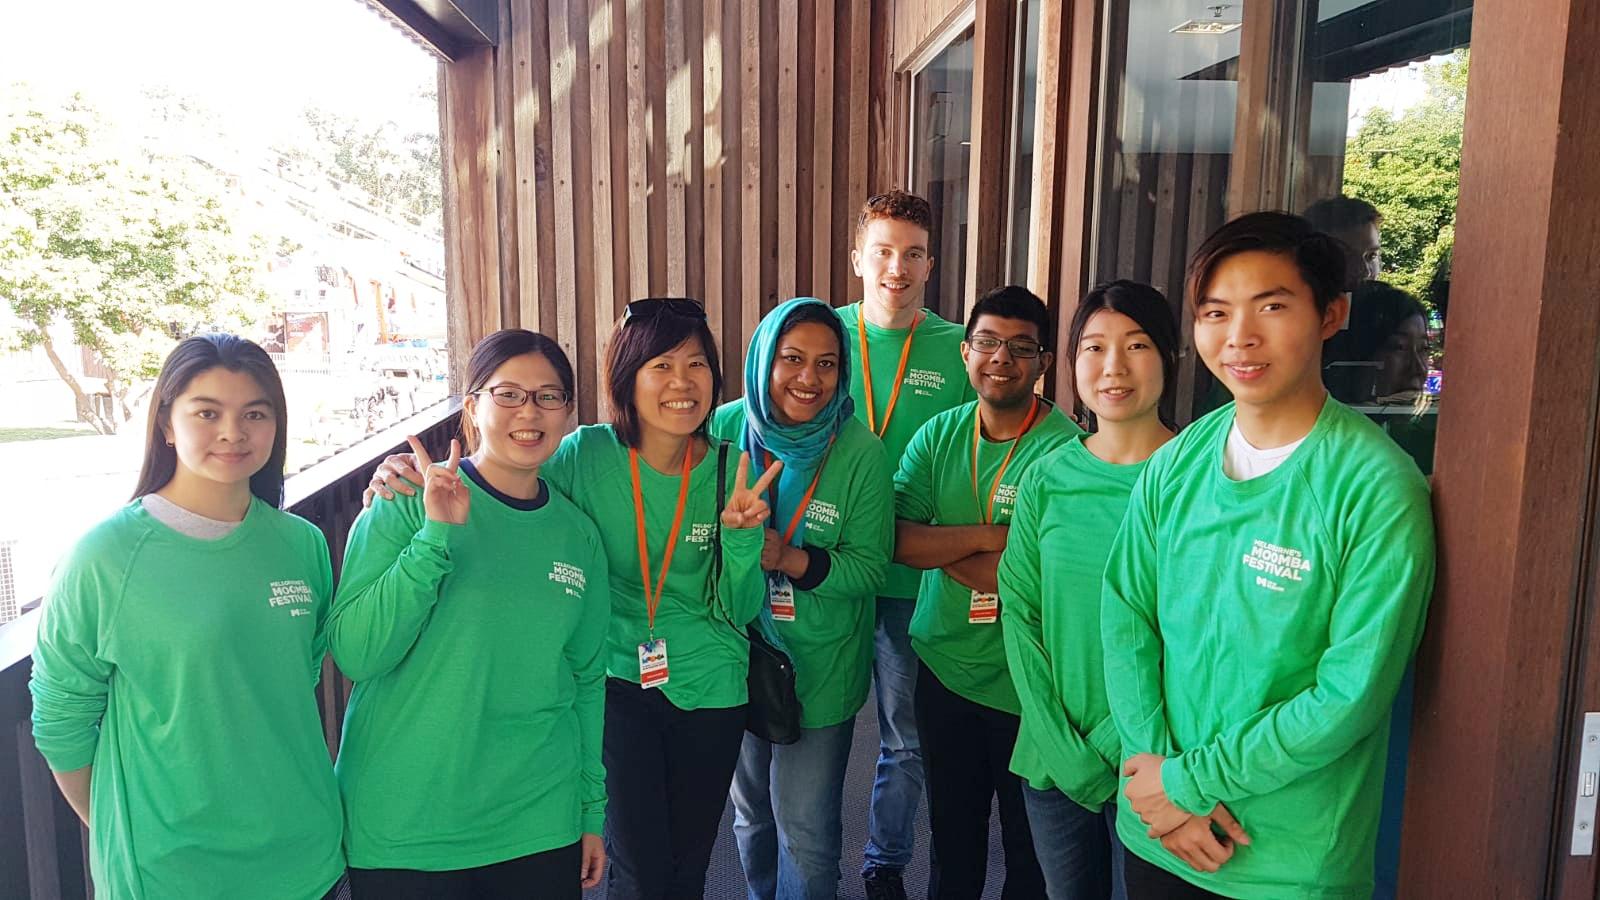 Moomba volunteers